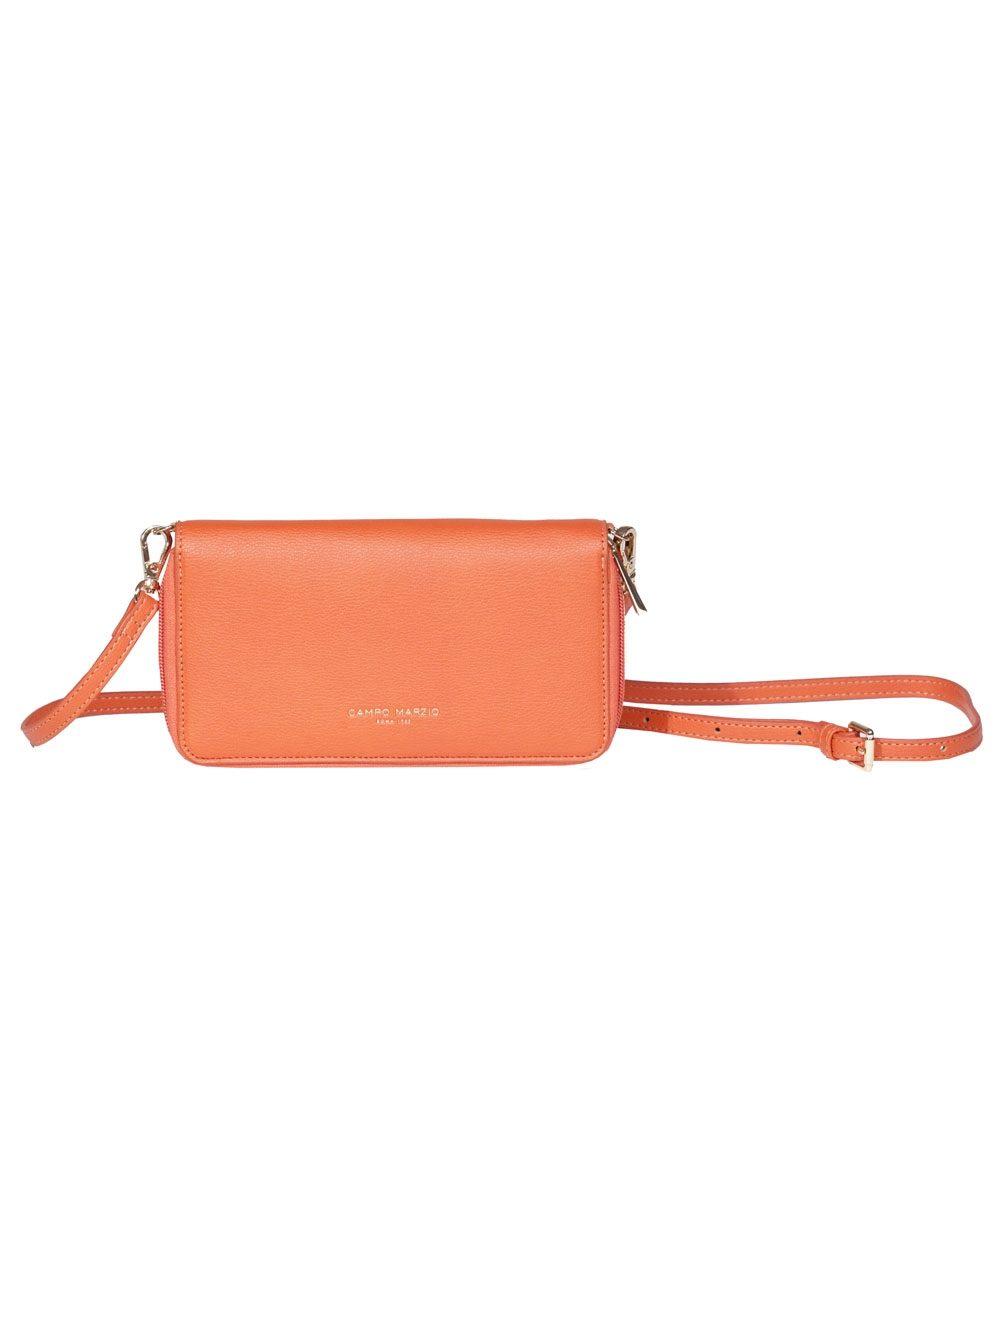 Charlotte Wallet Bag - Apricot